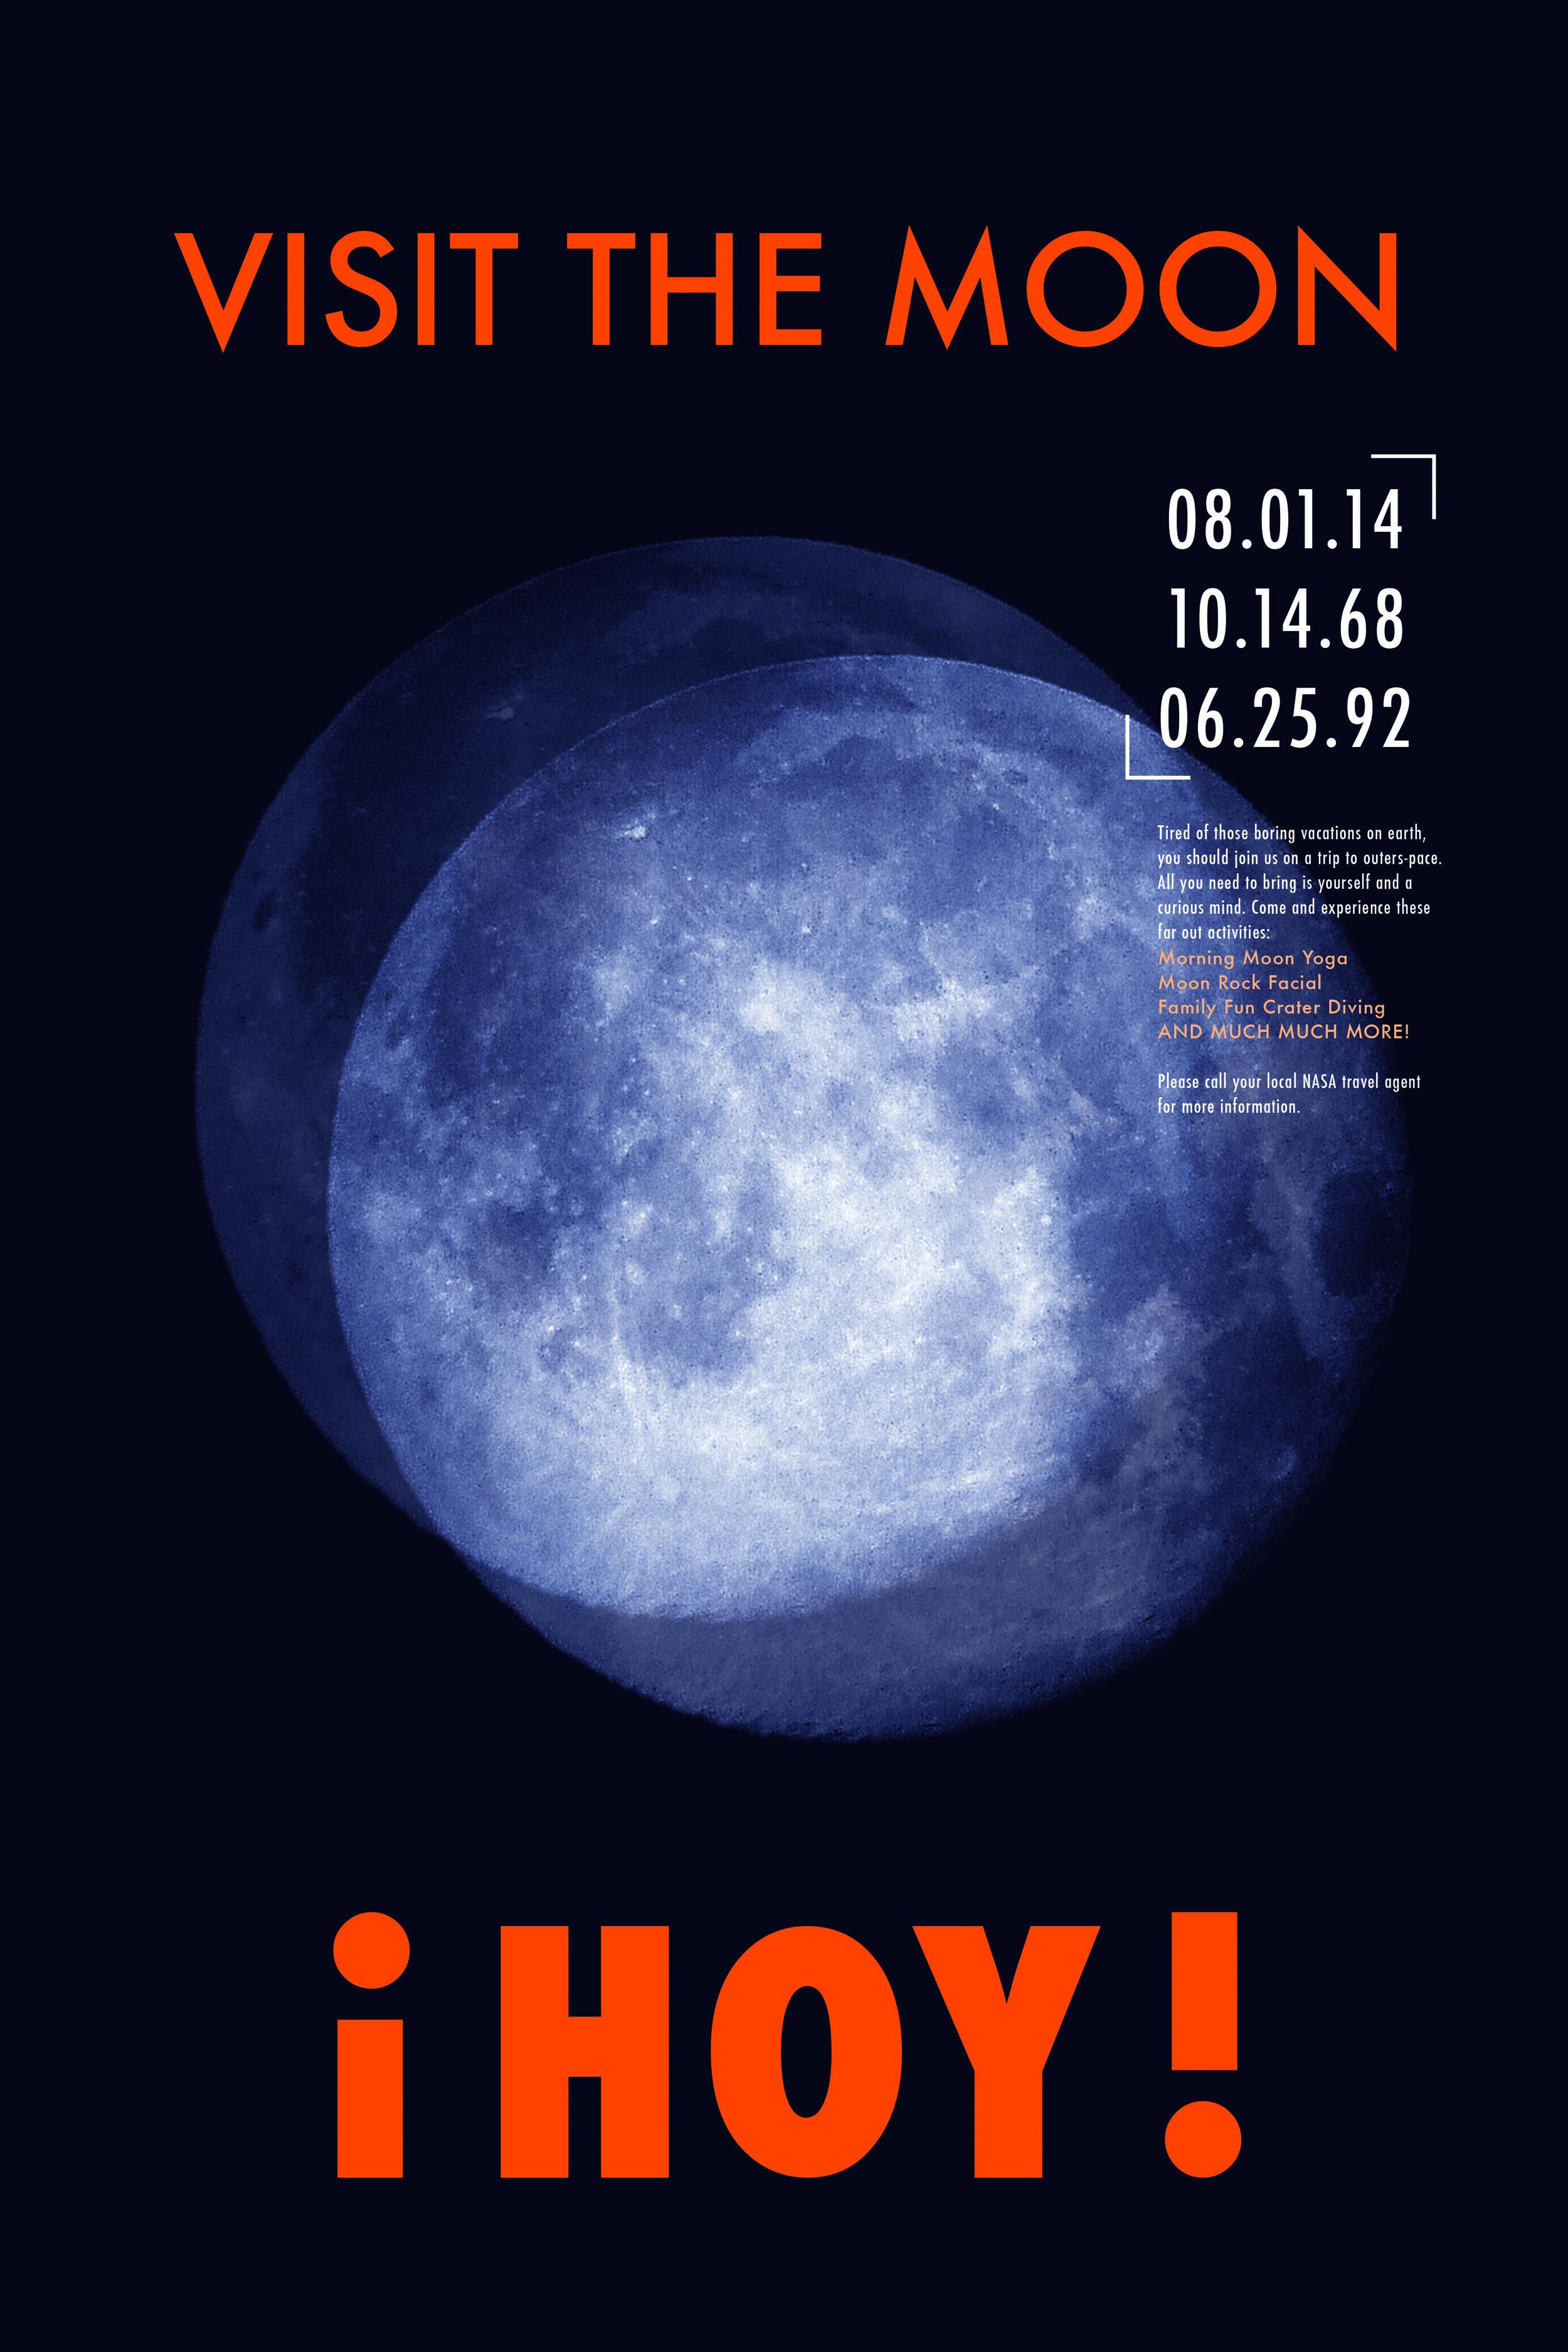 moon-hoy.jpg